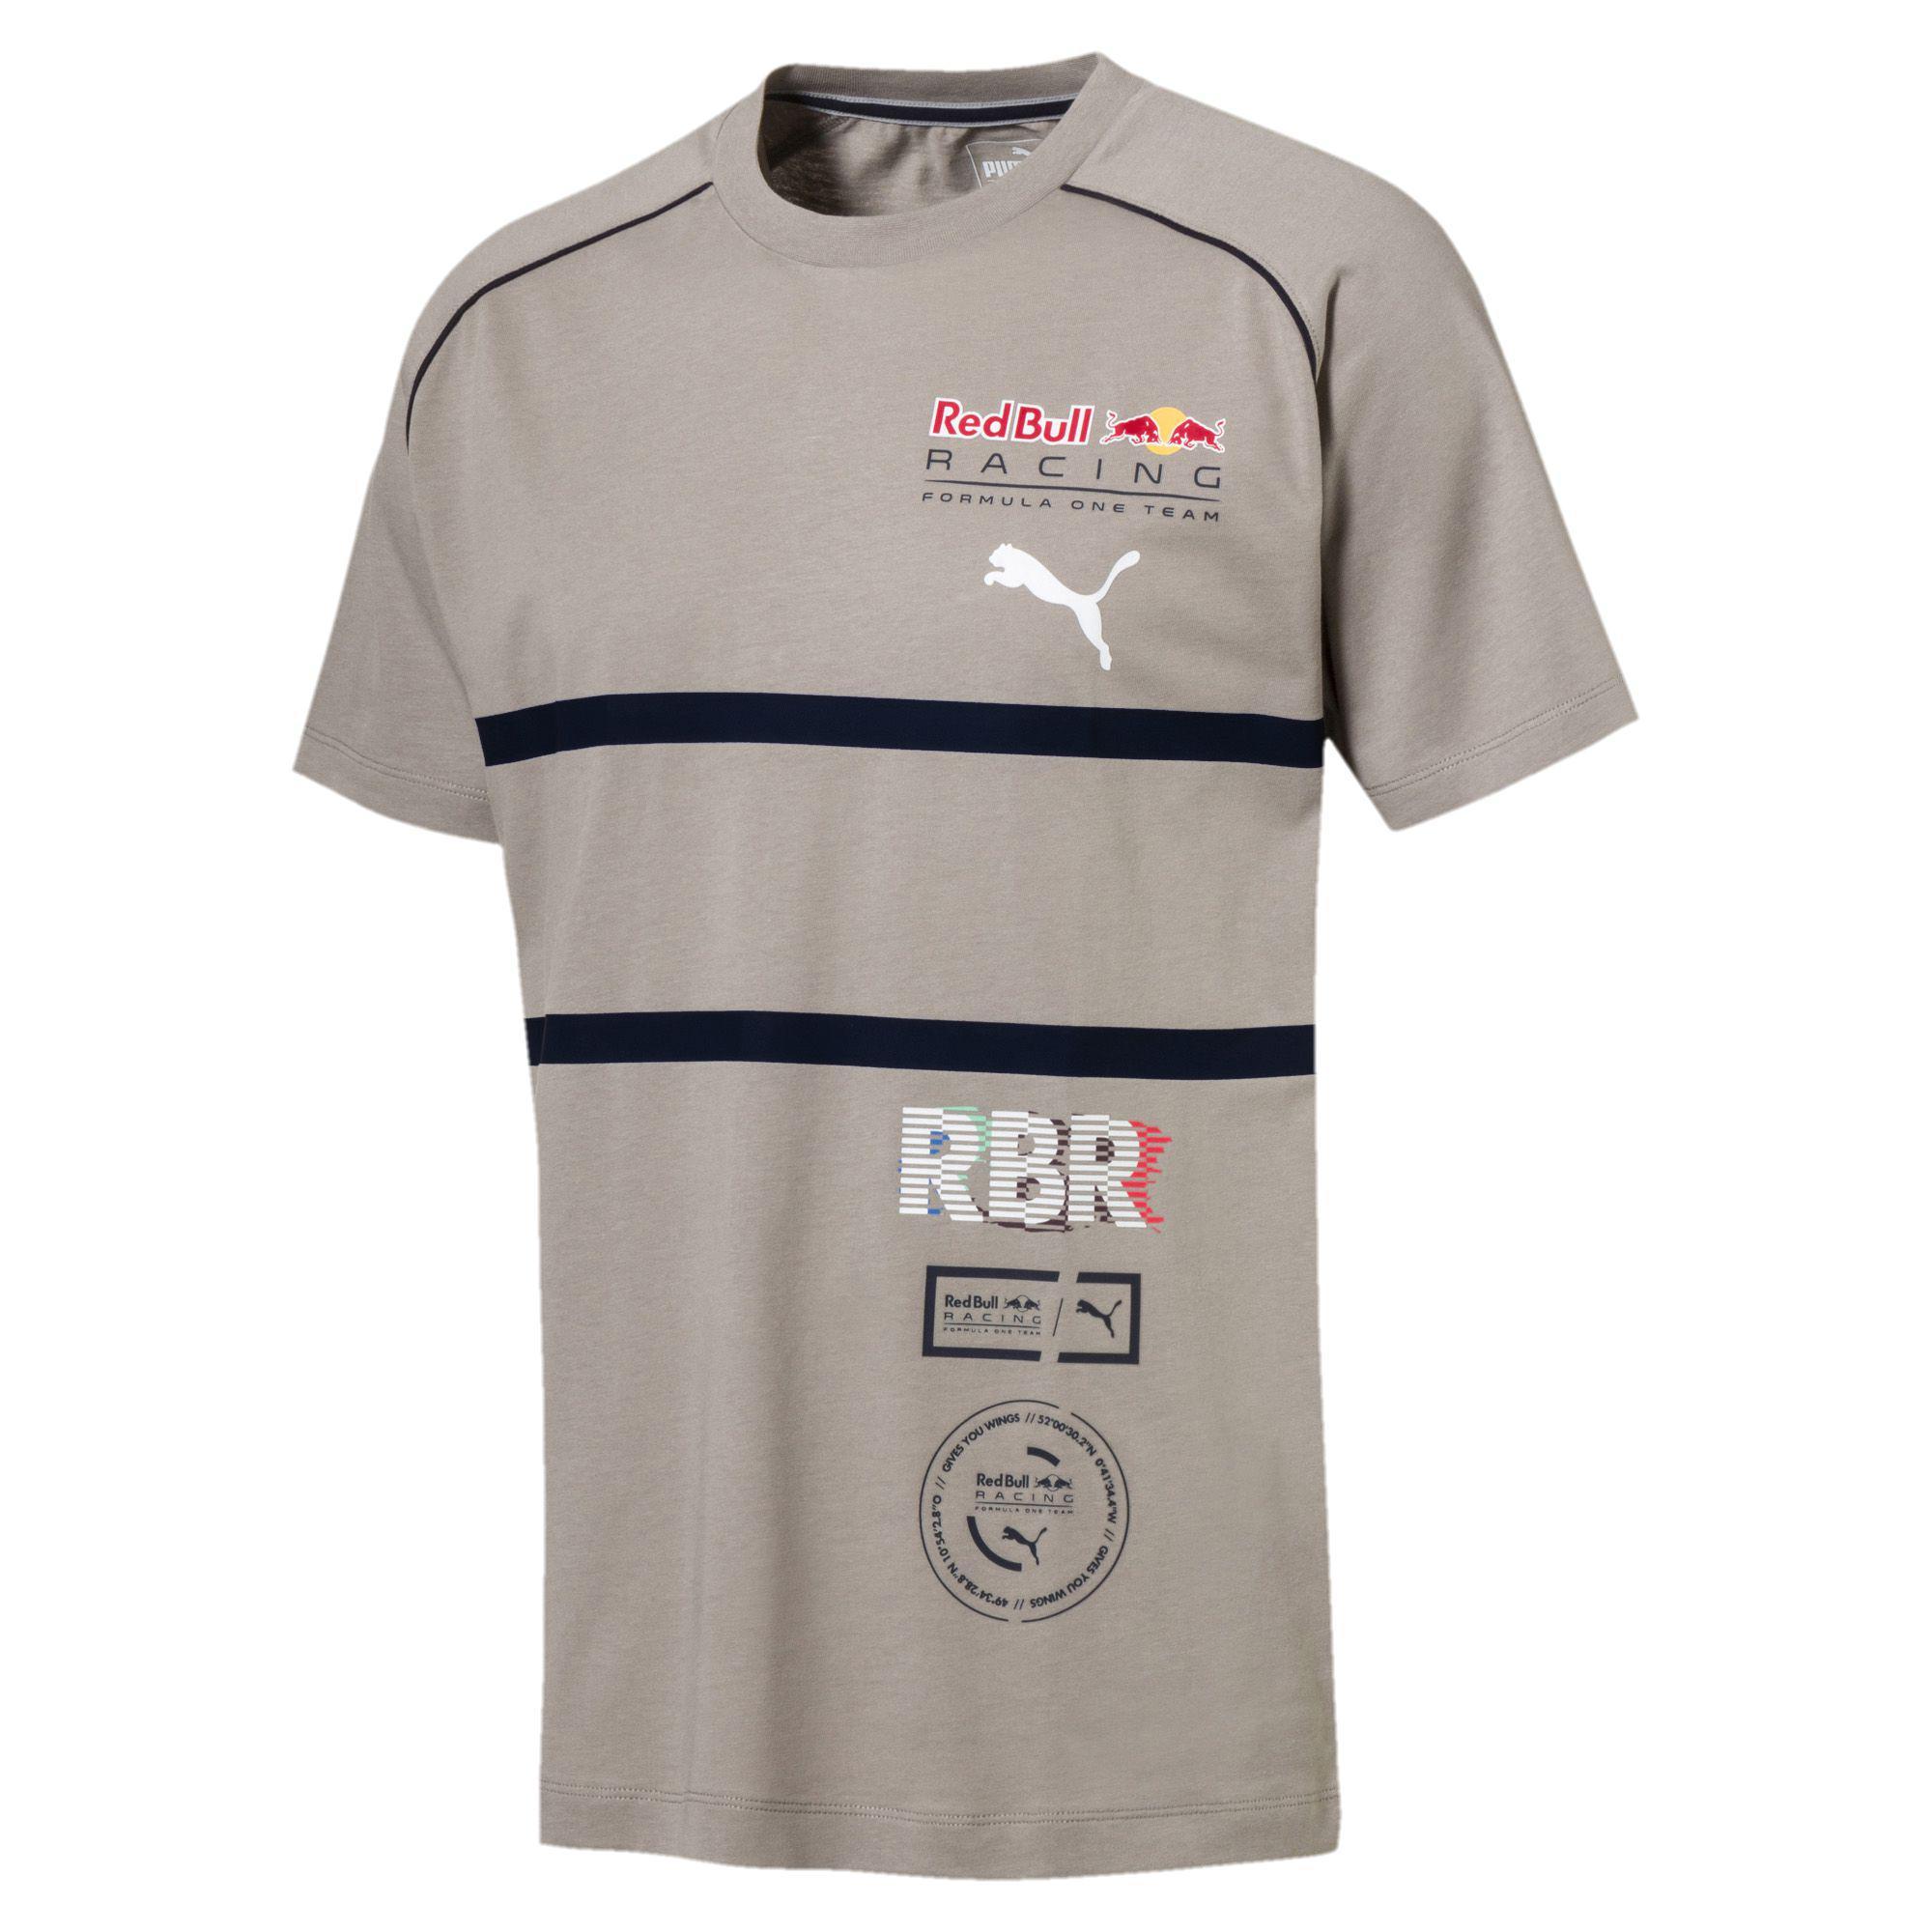 55d7b466578ac Lyst - PUMA Red Bull Racing Speedcat Evo Men s Tee in Gray for Men